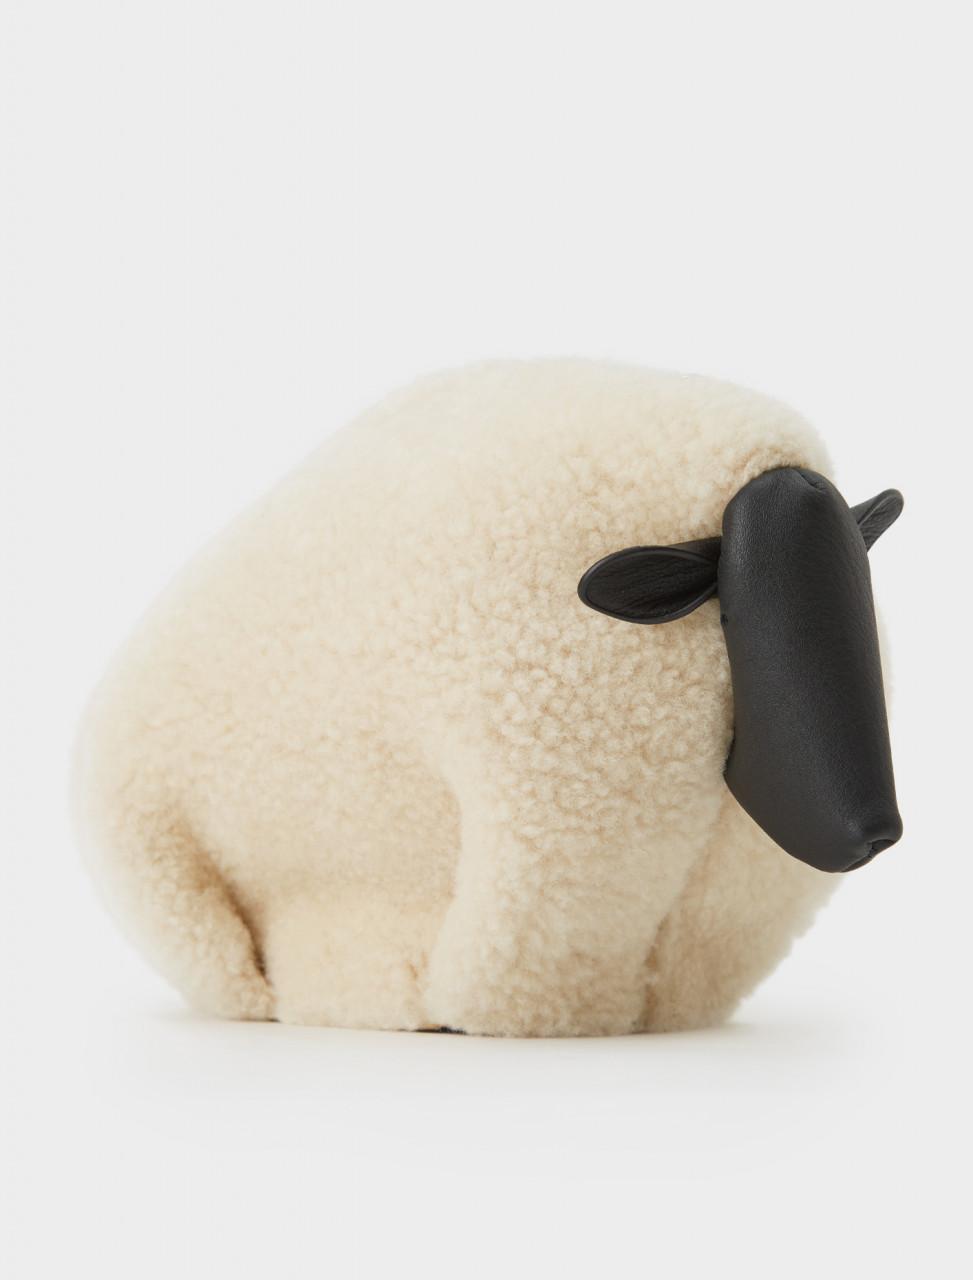 251-A623SH1X01 LOEWE SHEEP BAG NATURAL